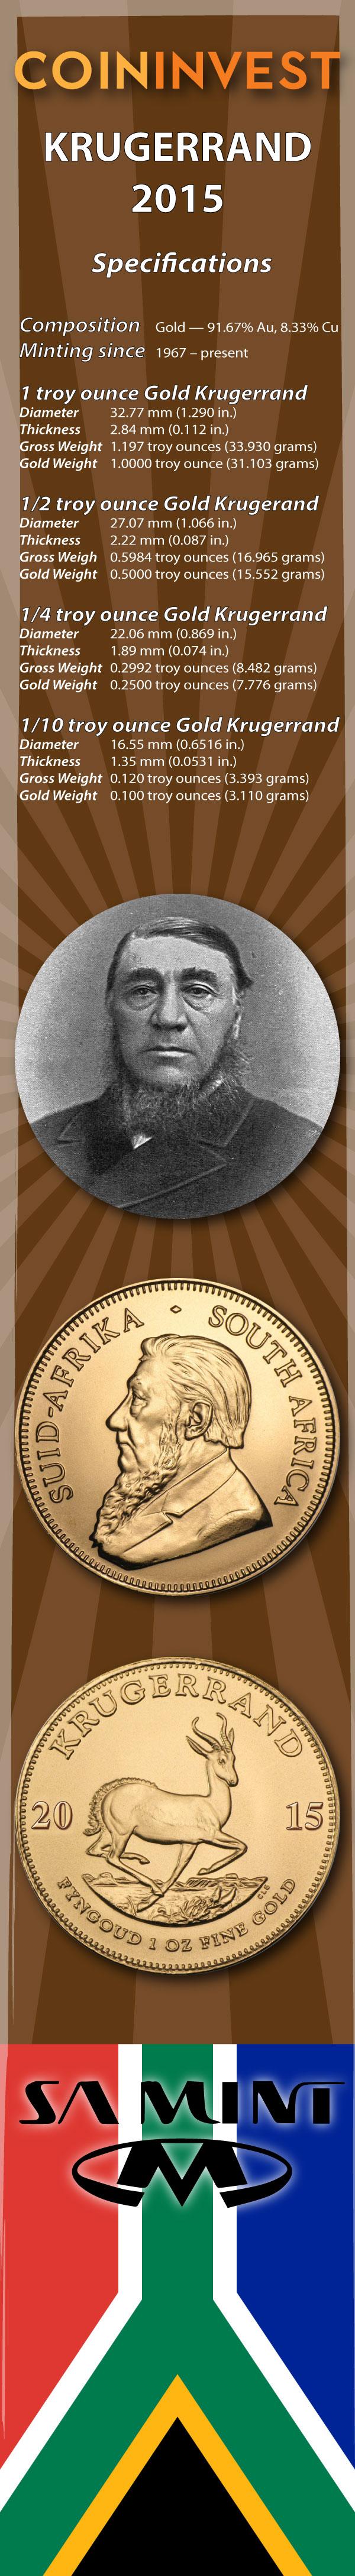 Krügerrand 2015 — Goldmünze Südafrika — South African Mint (Infografik)